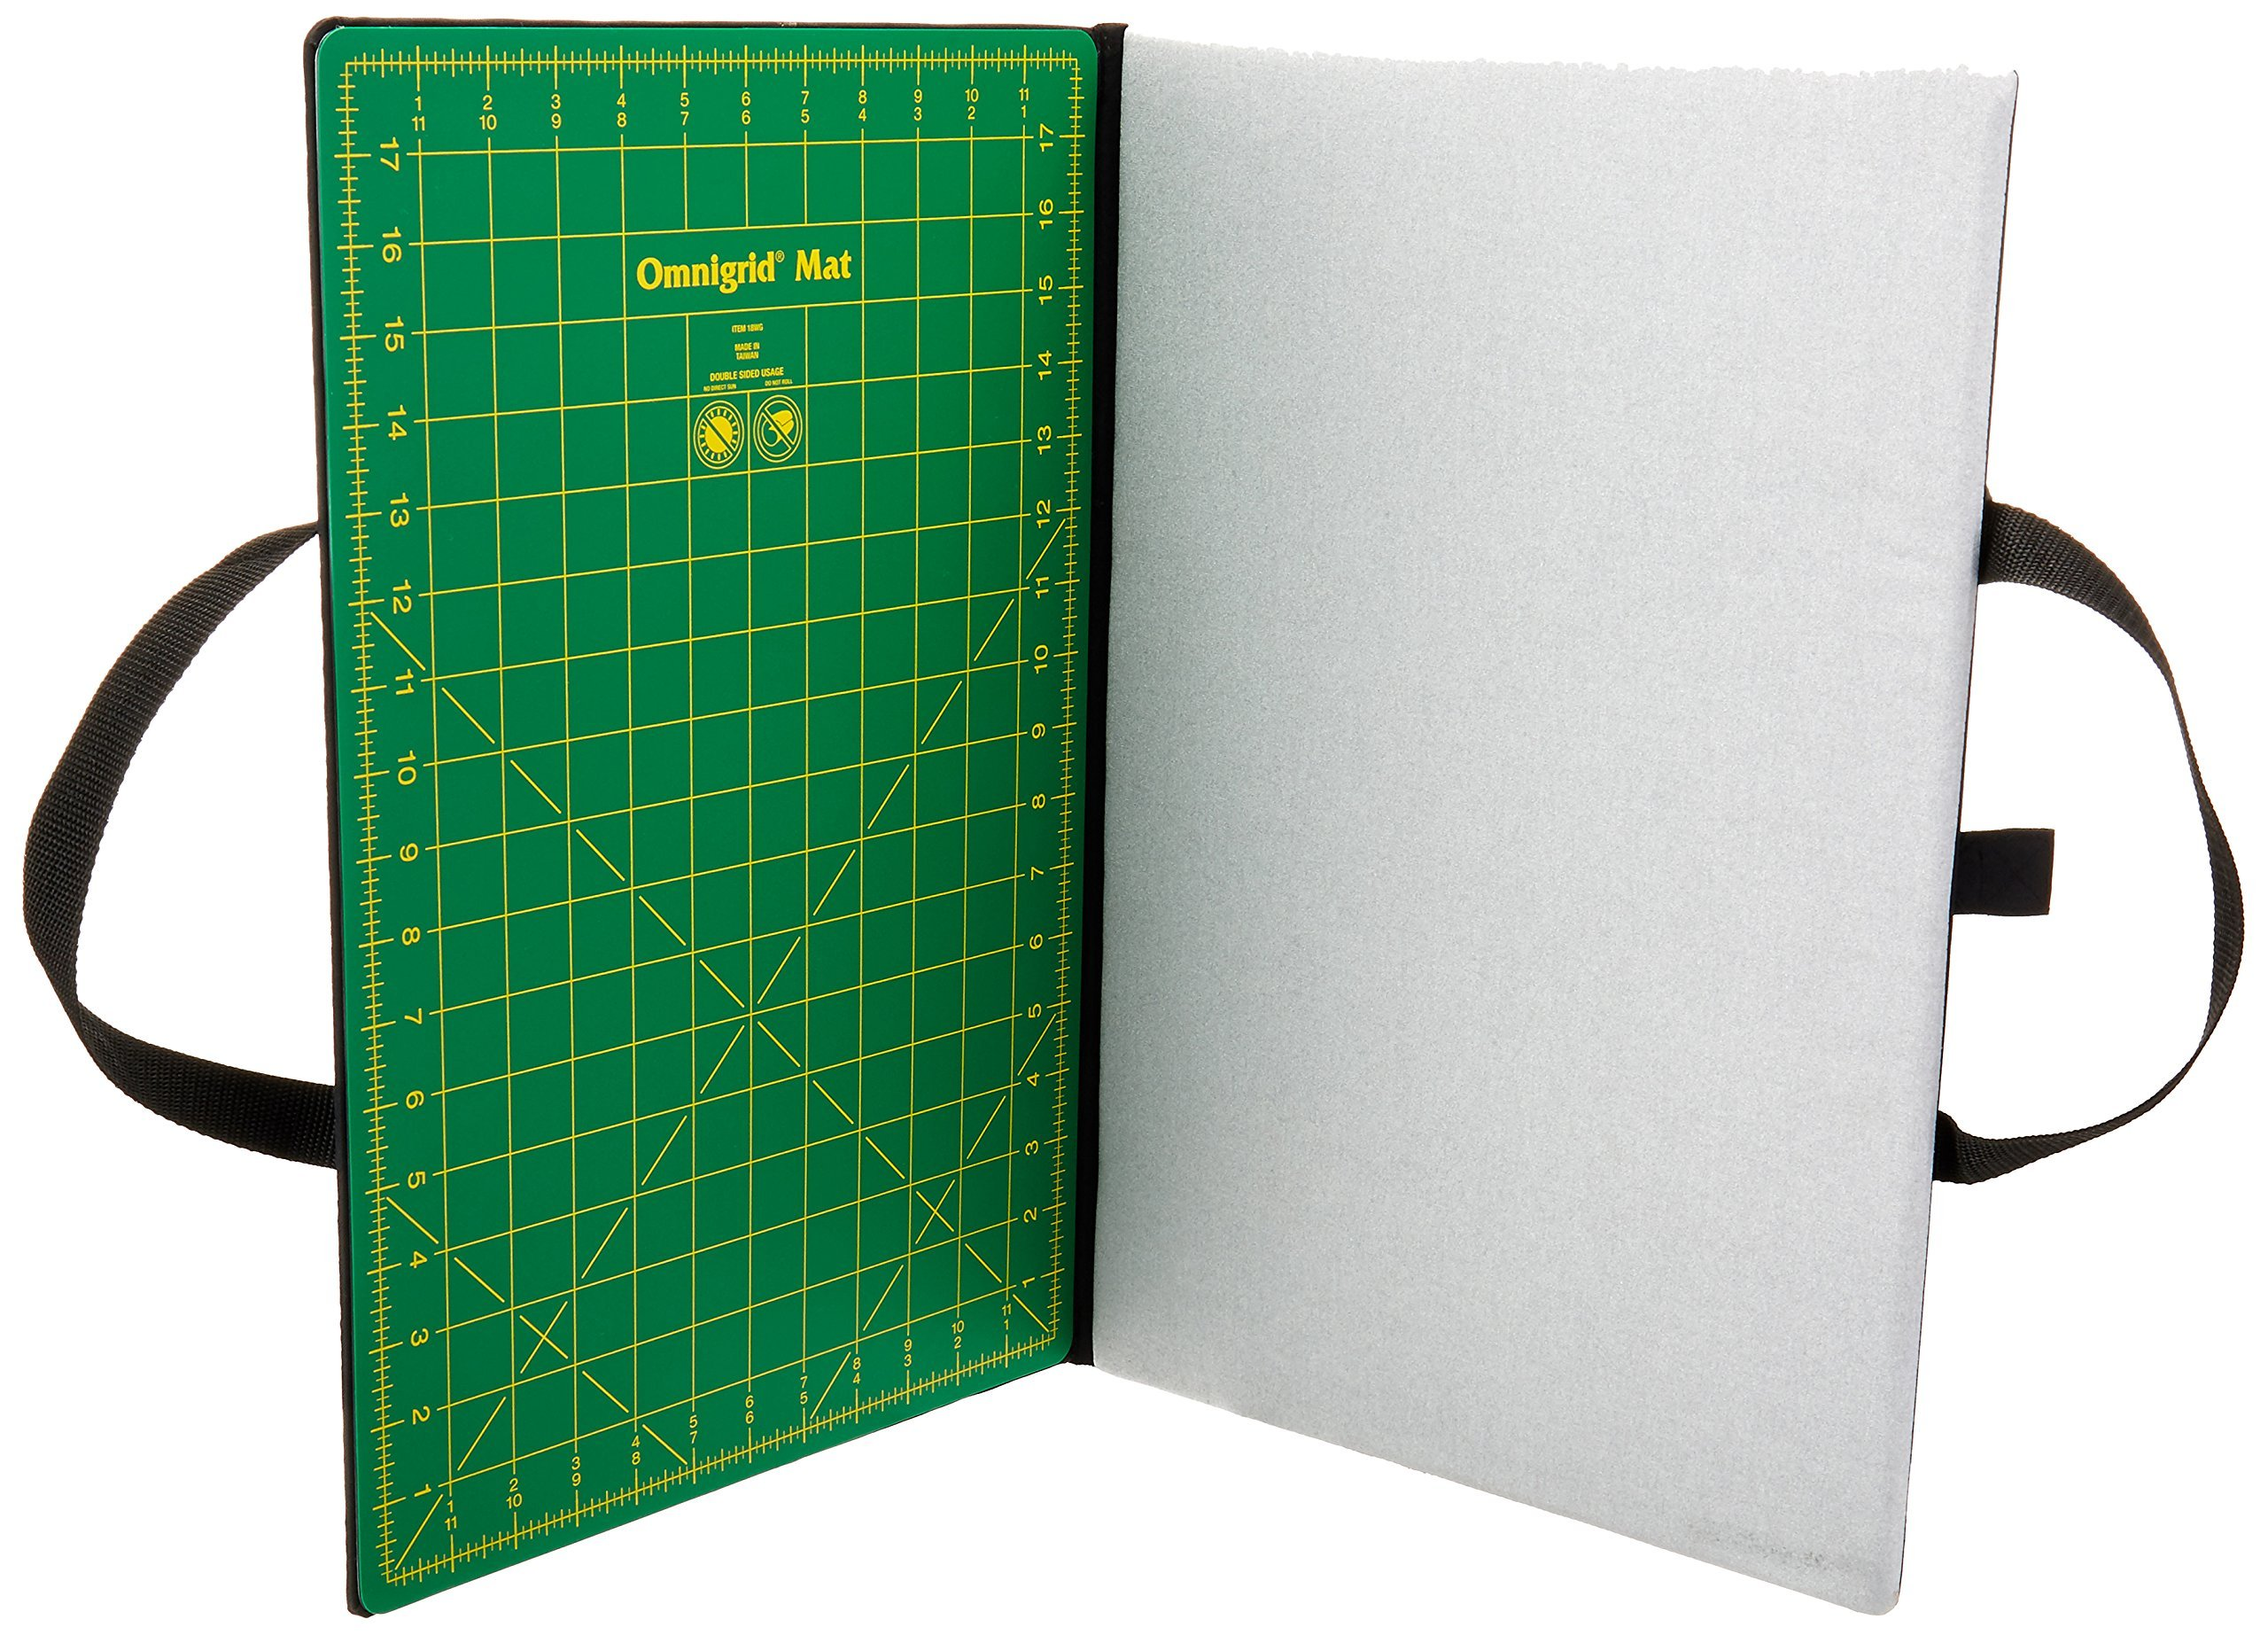 die embossing dies board craftasmic mats rubber mat cutting accessories gemini machines